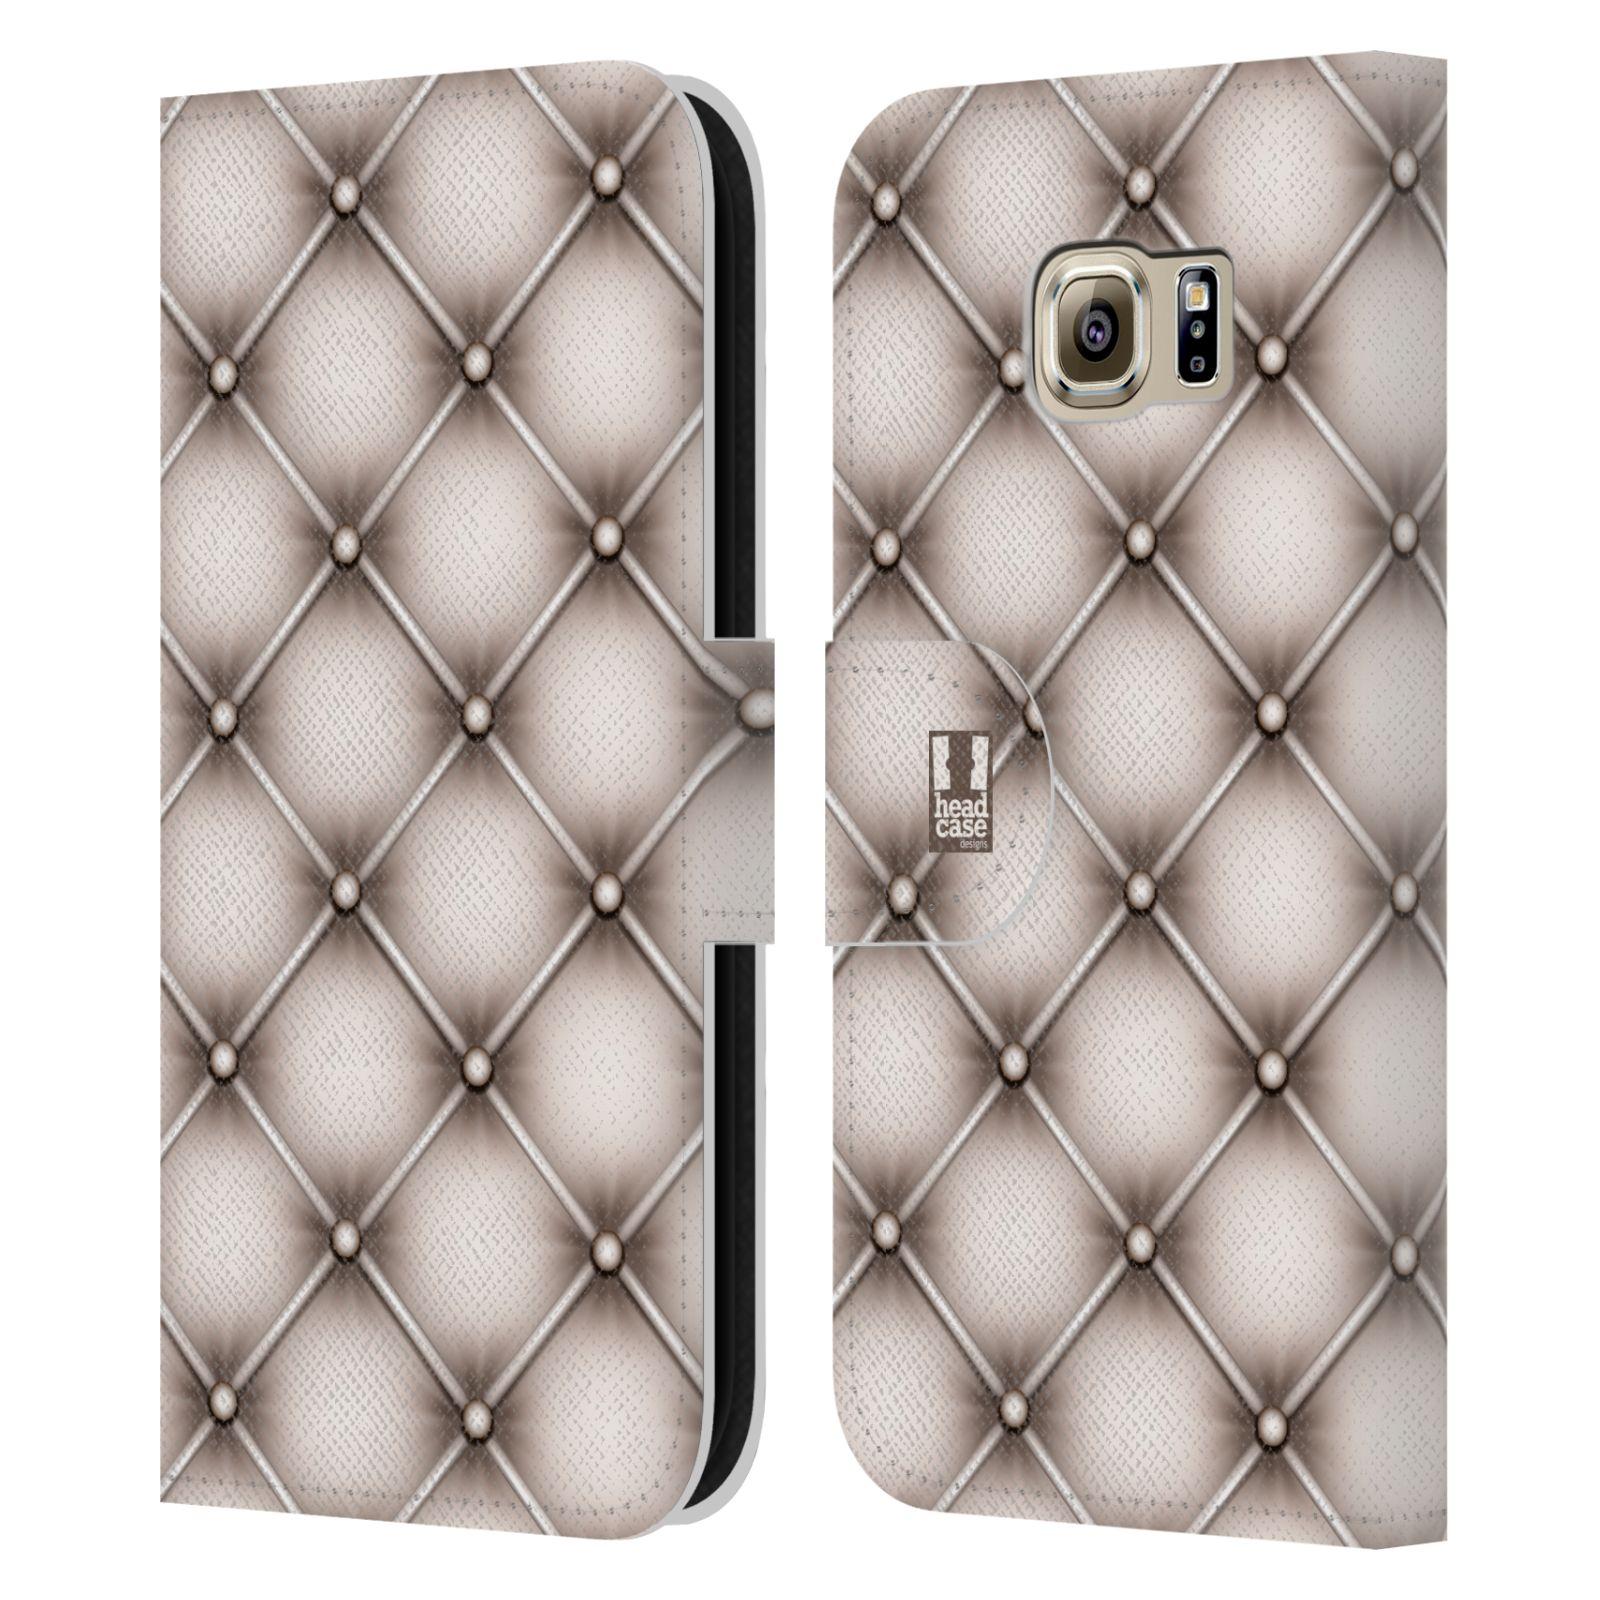 head case kissen brieftasche handyh lle aus leder f r samsung phones 1 ebay. Black Bedroom Furniture Sets. Home Design Ideas